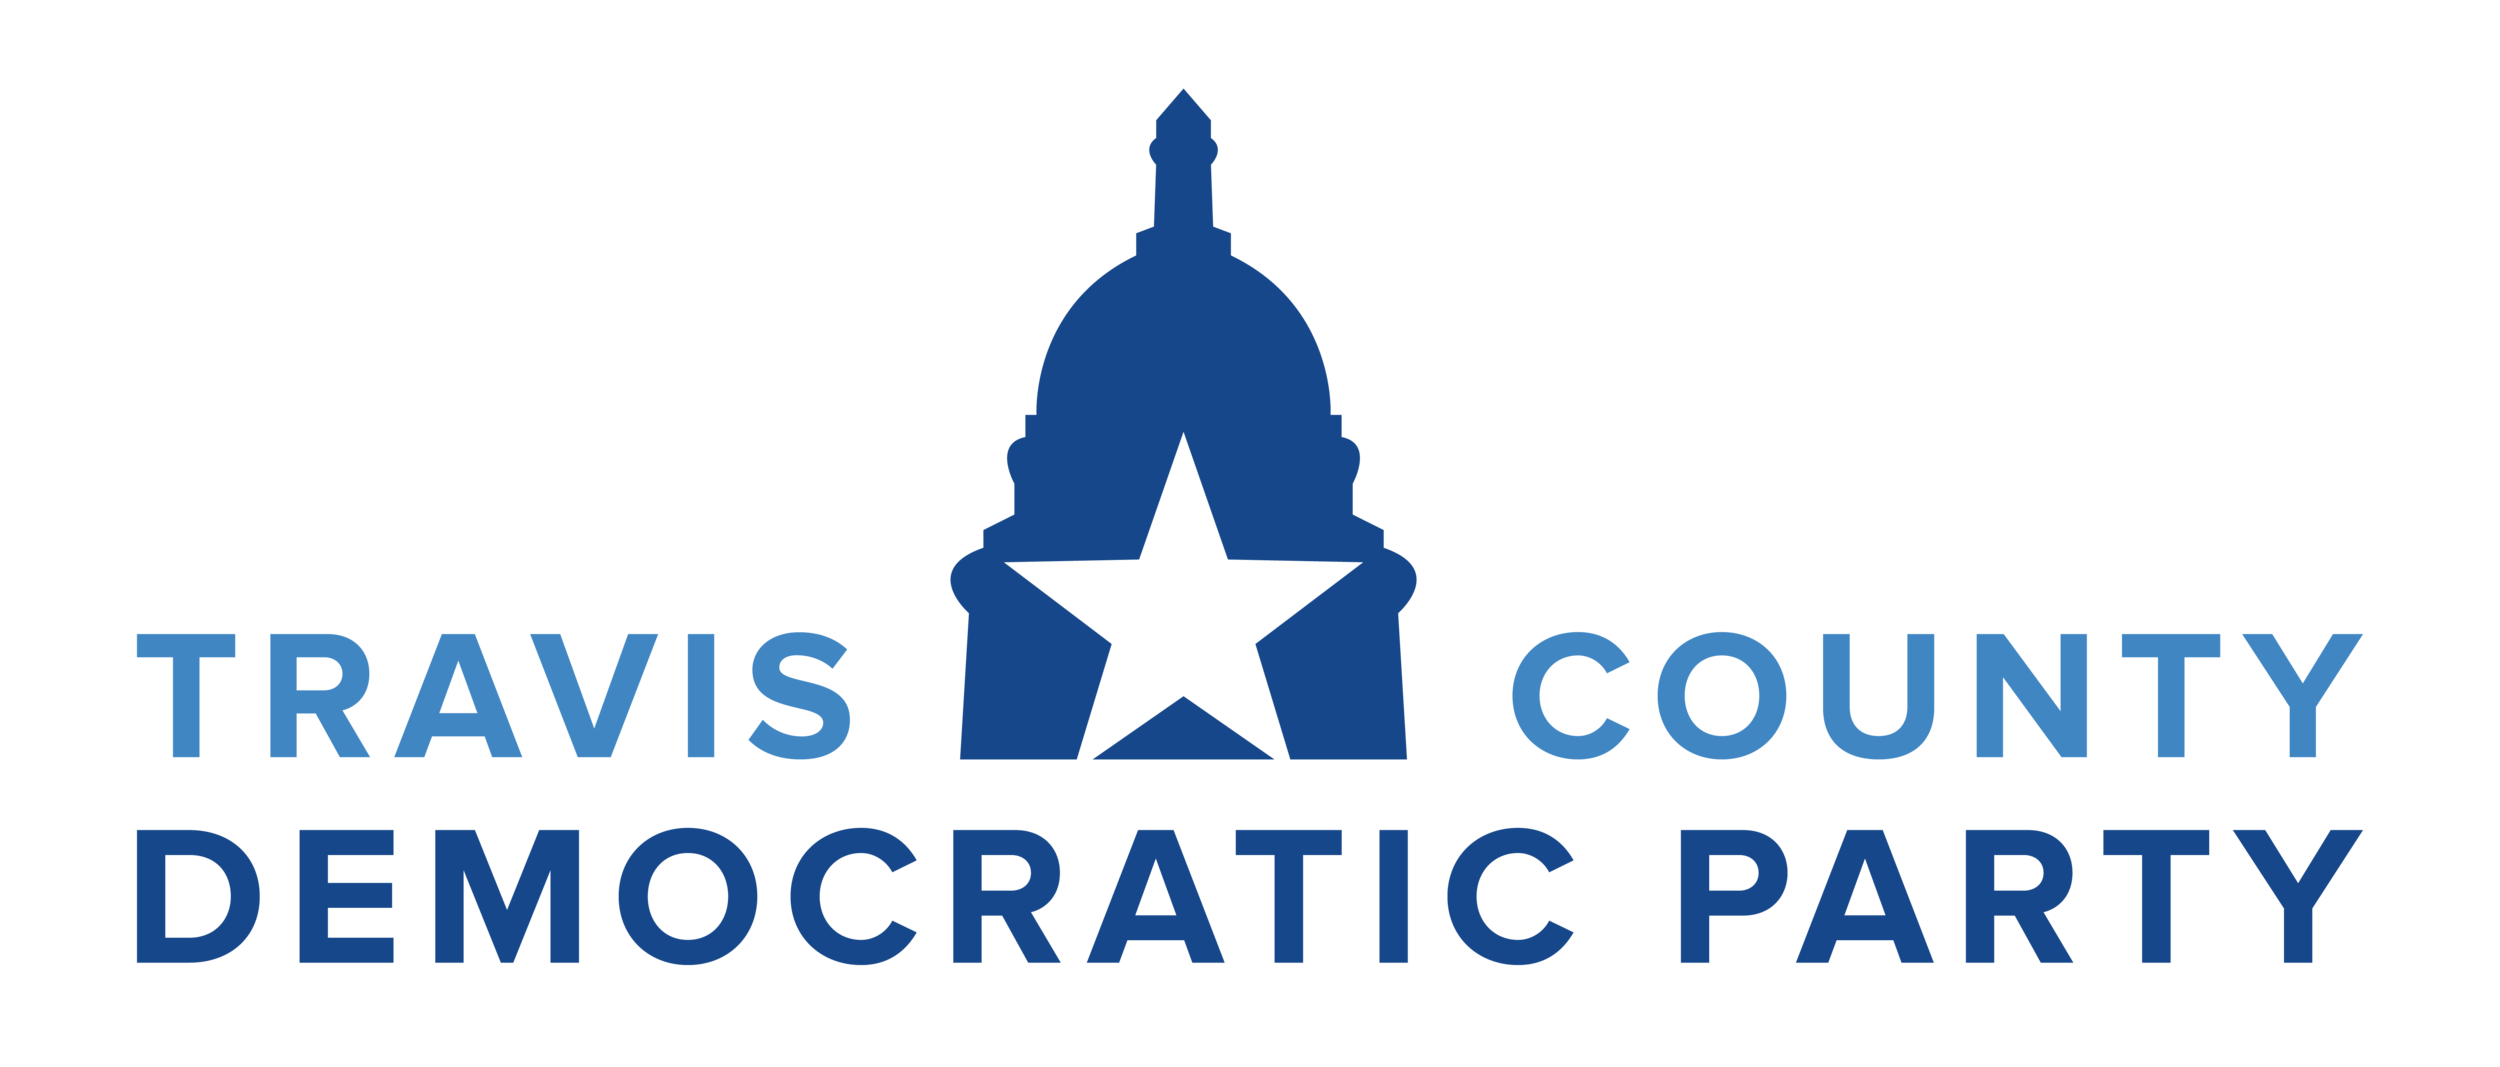 TCDP_Logo-01.png